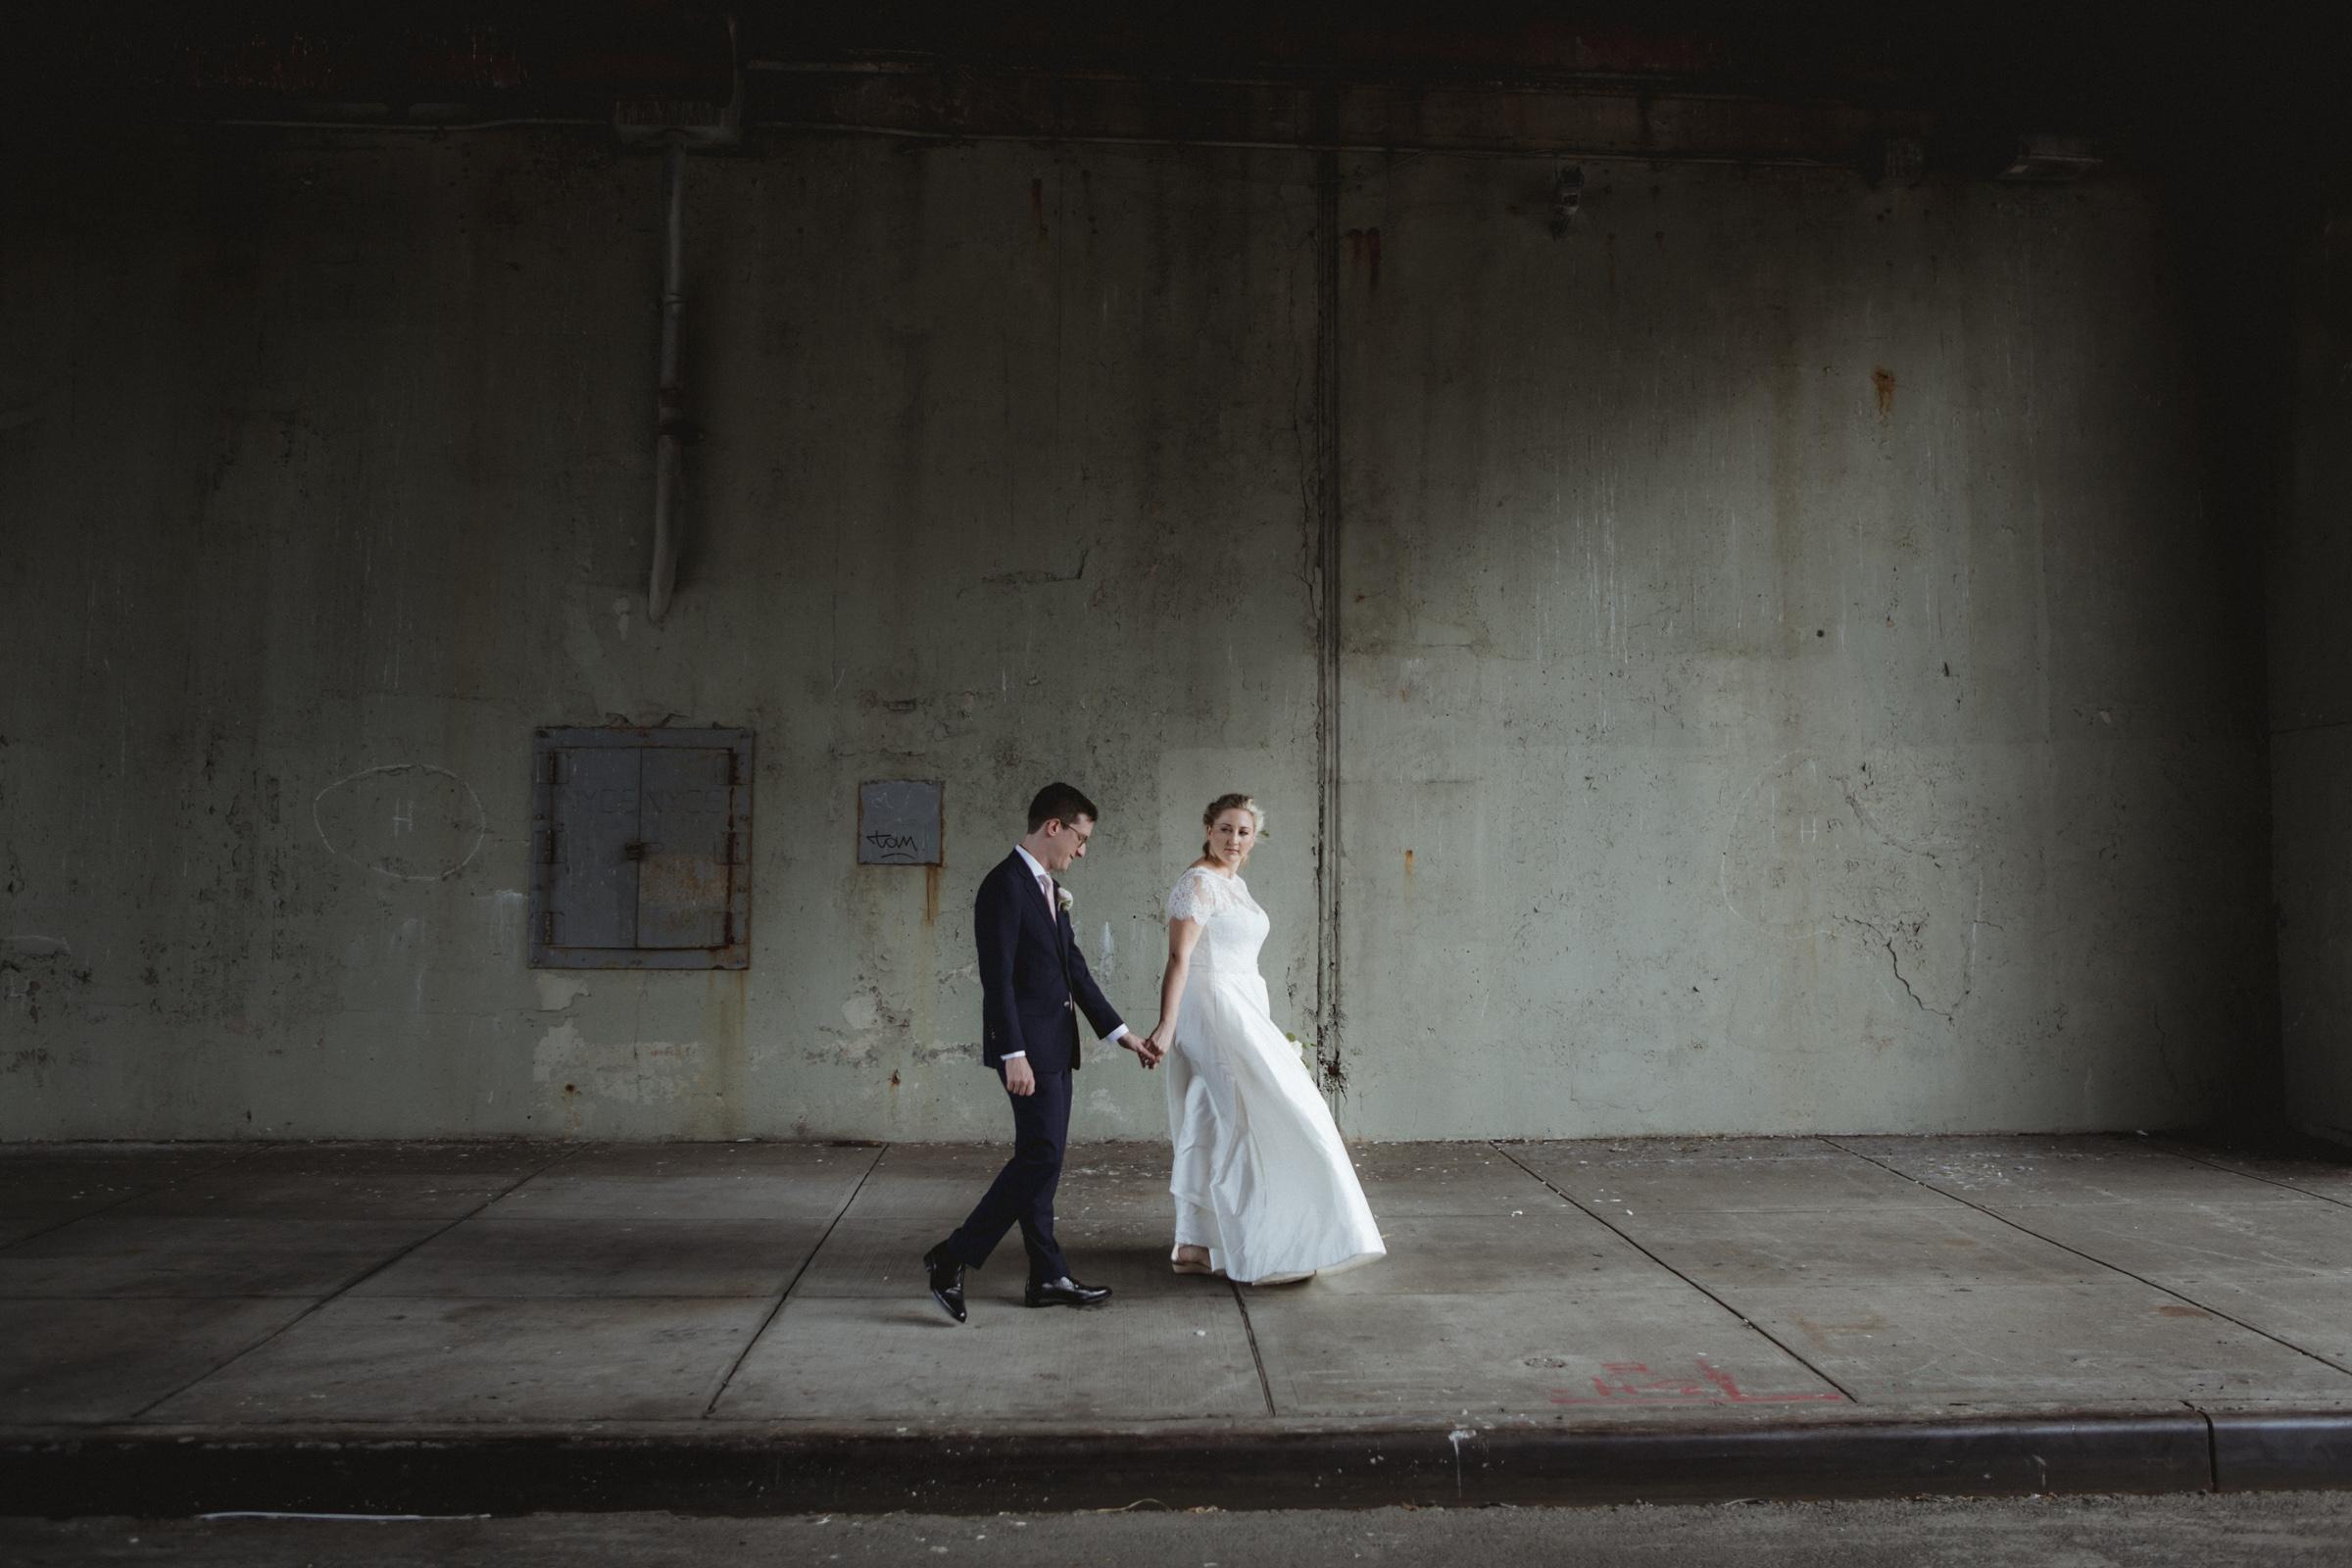 Amy Sims Photography | Bride and Groom walk hand in hand under shaded bridge | Brooklyn Wedding | Box House Hotel Wedding